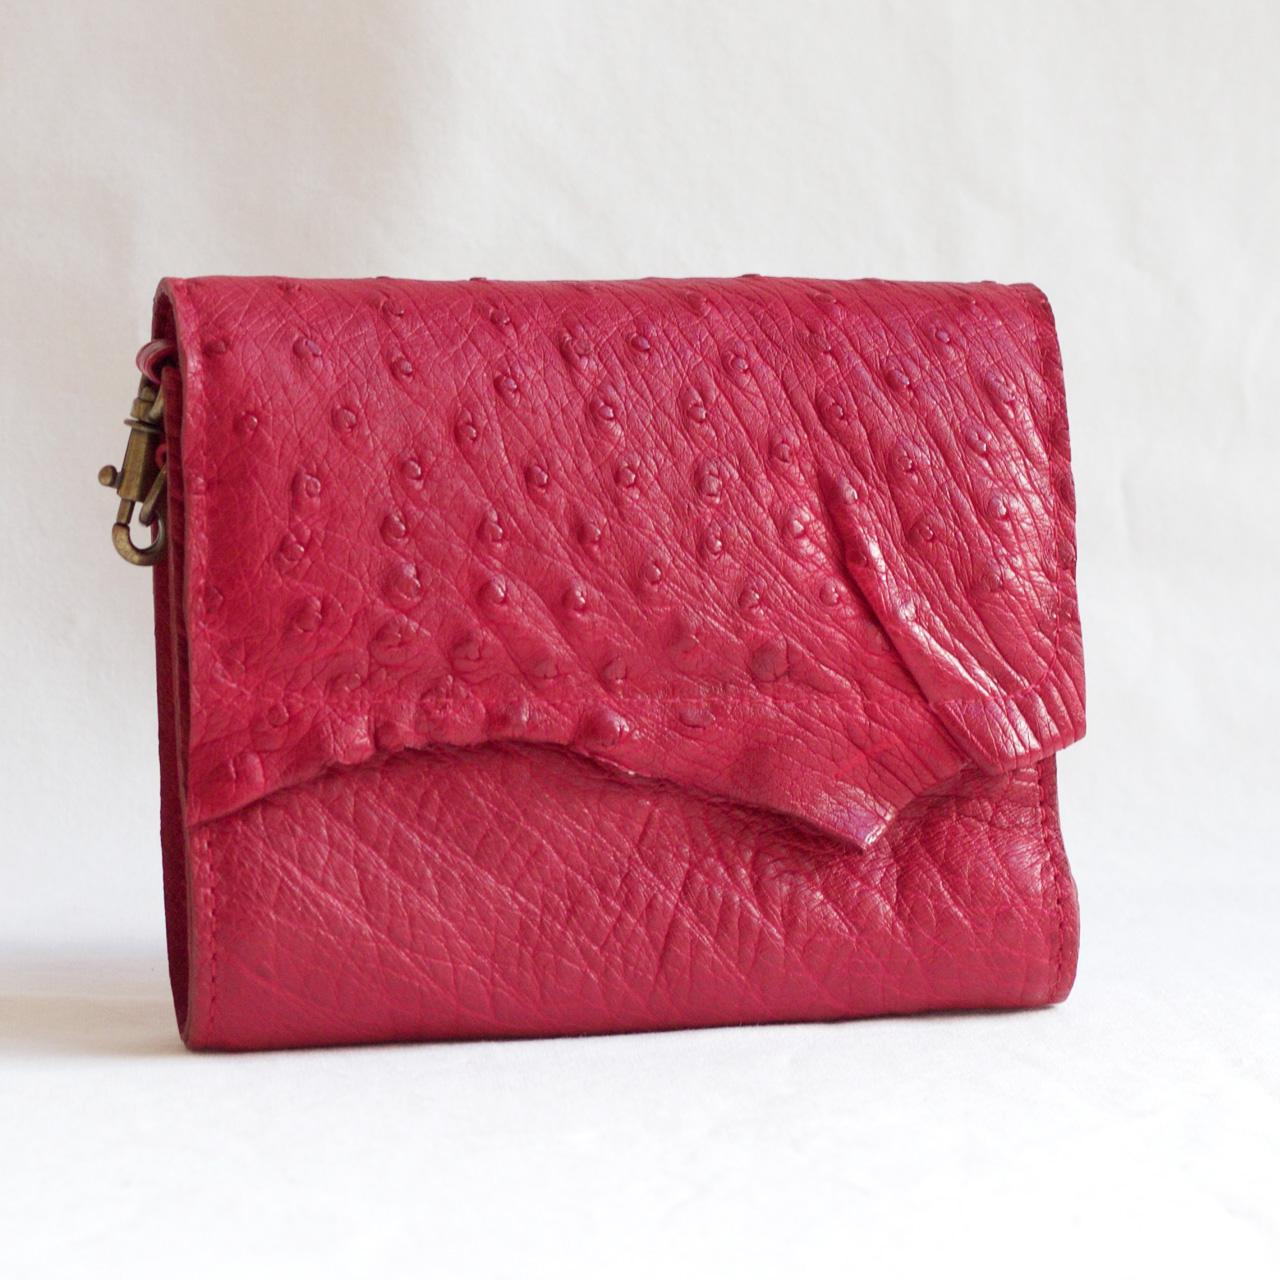 c347971661a Punane kott jaanalinnunahast